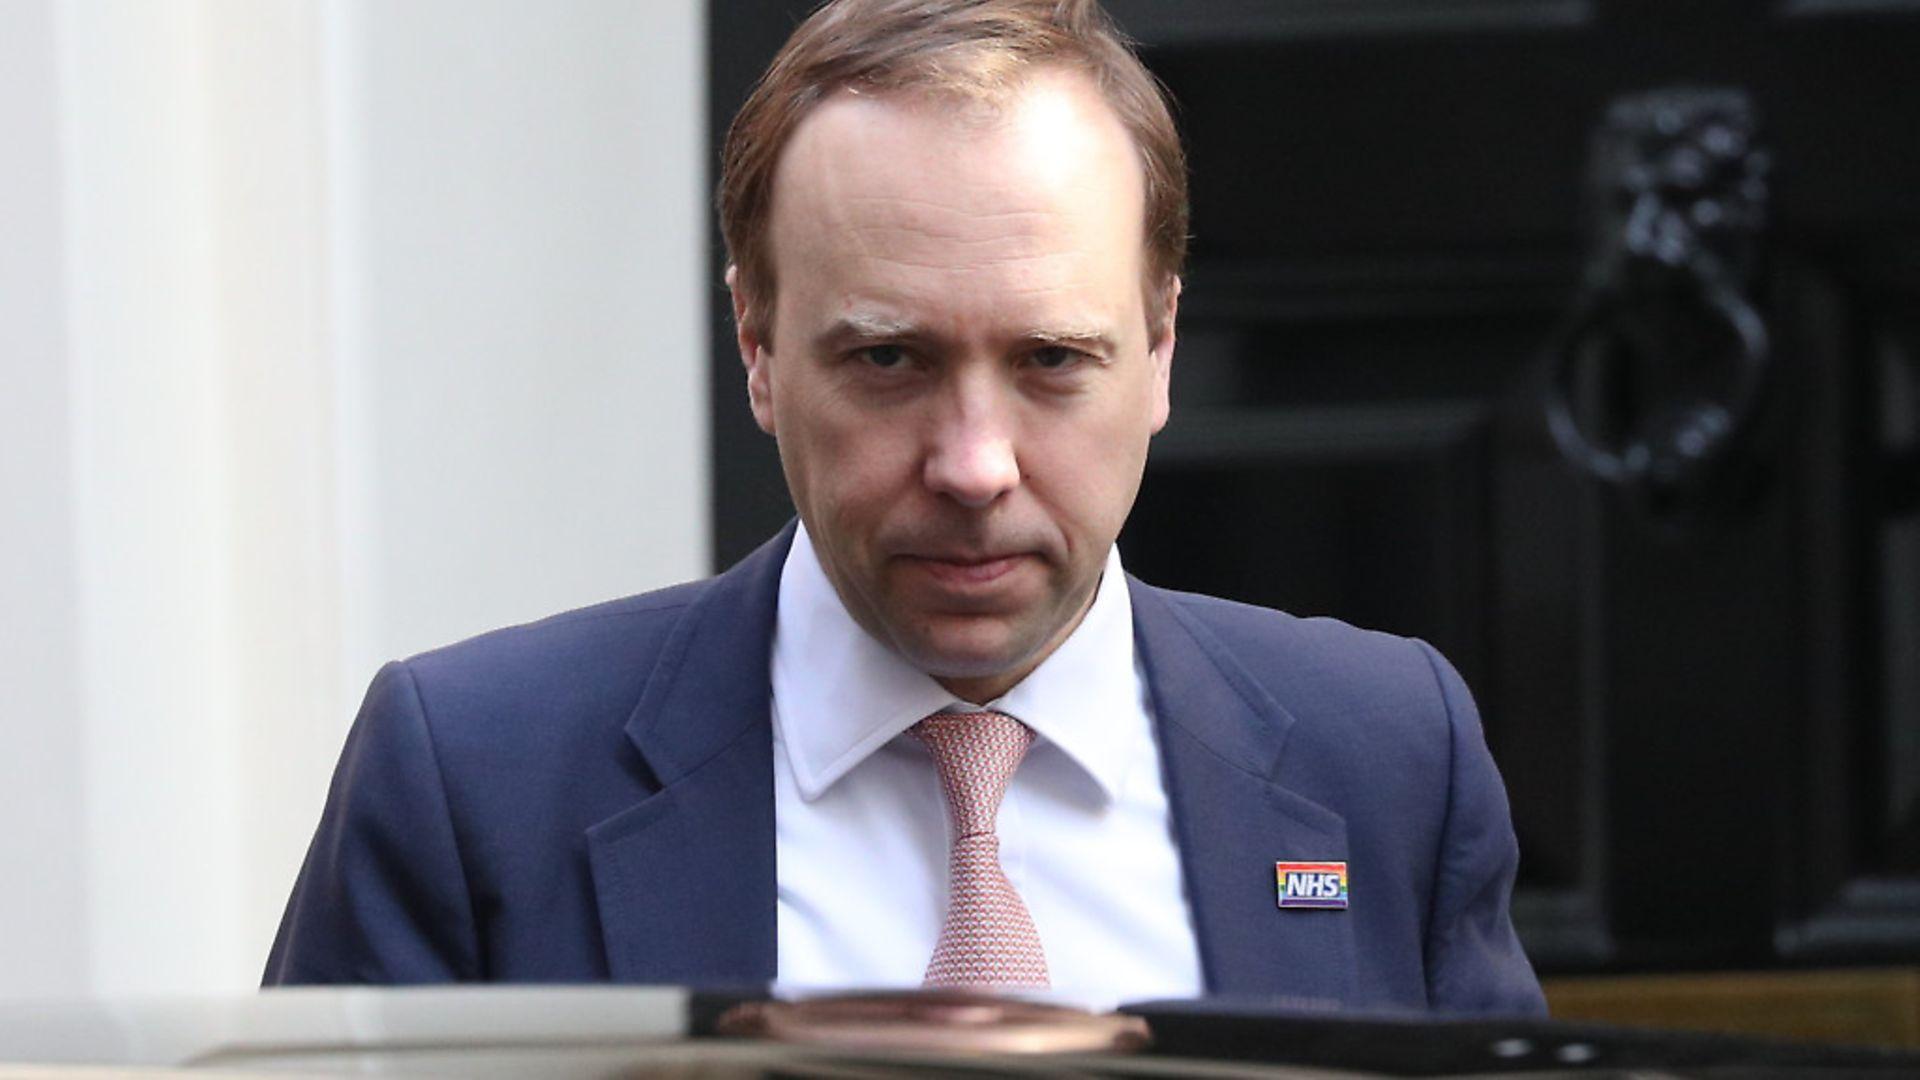 Health minister Matt Hancock leaves Downing Street. - Credit: PA